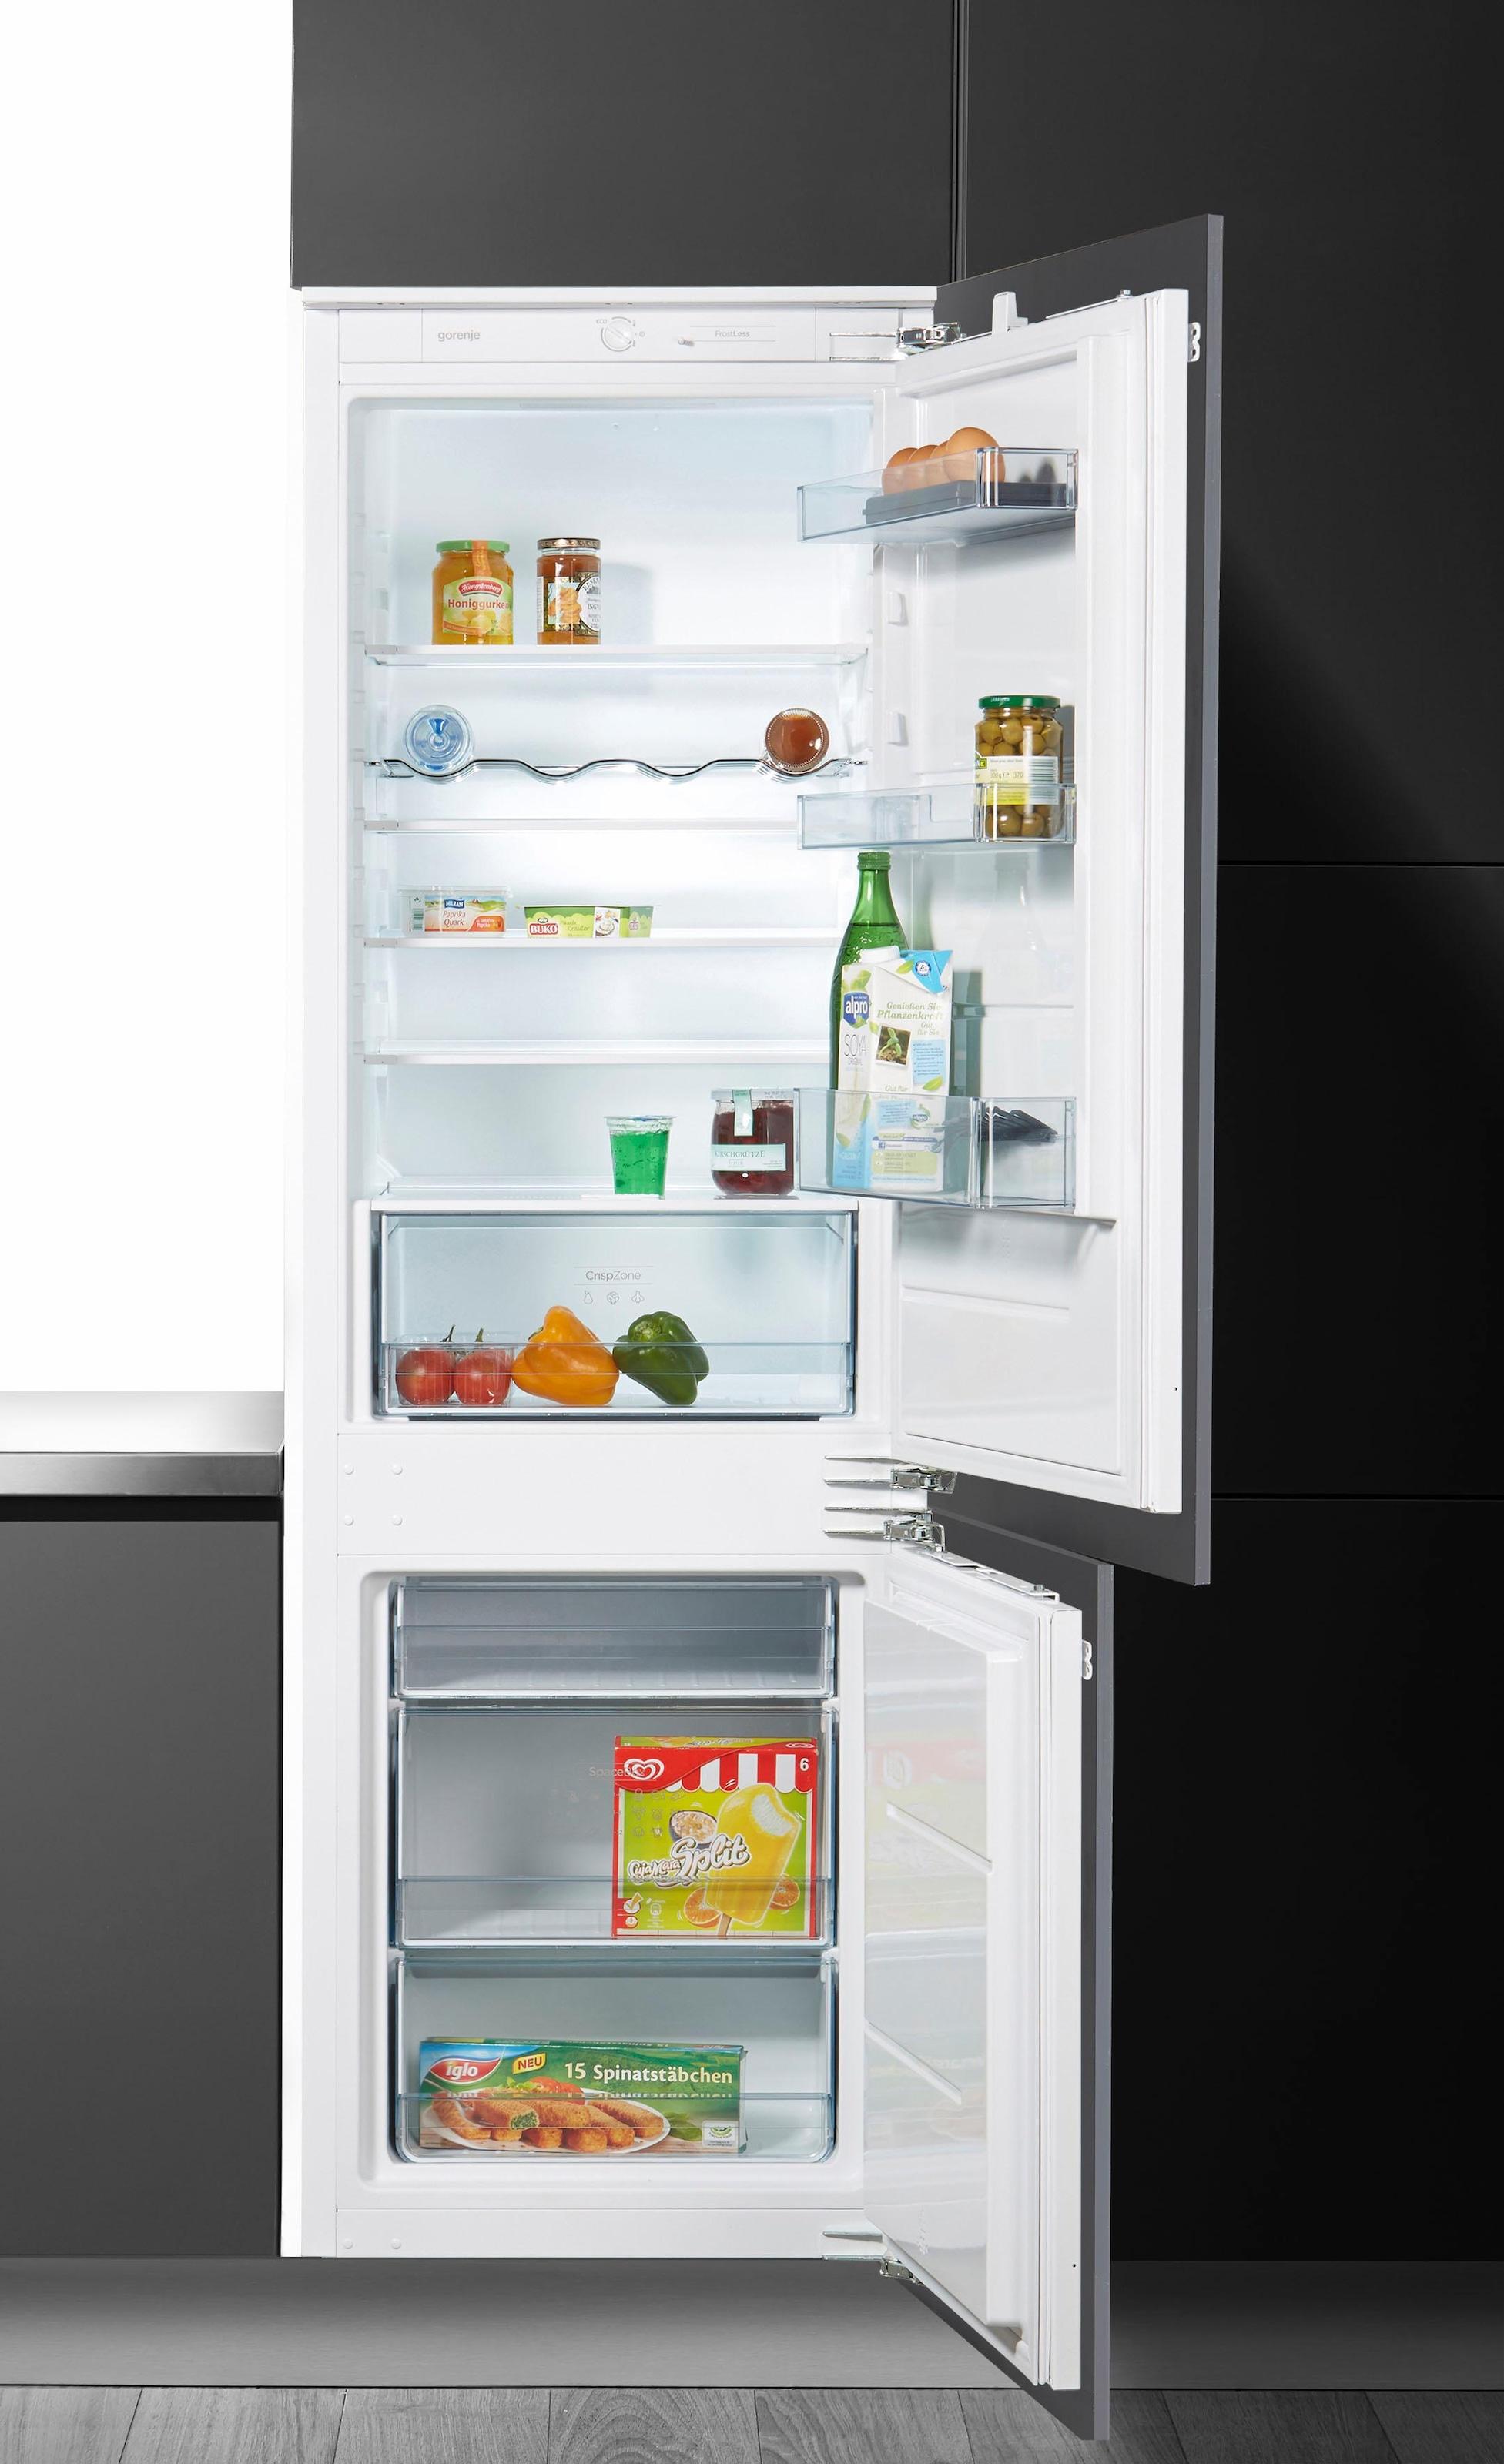 Gorenje Kühlschrank Preisvergleich : Gorenje kühlschränke onlineshop gorenje kühlschränke online